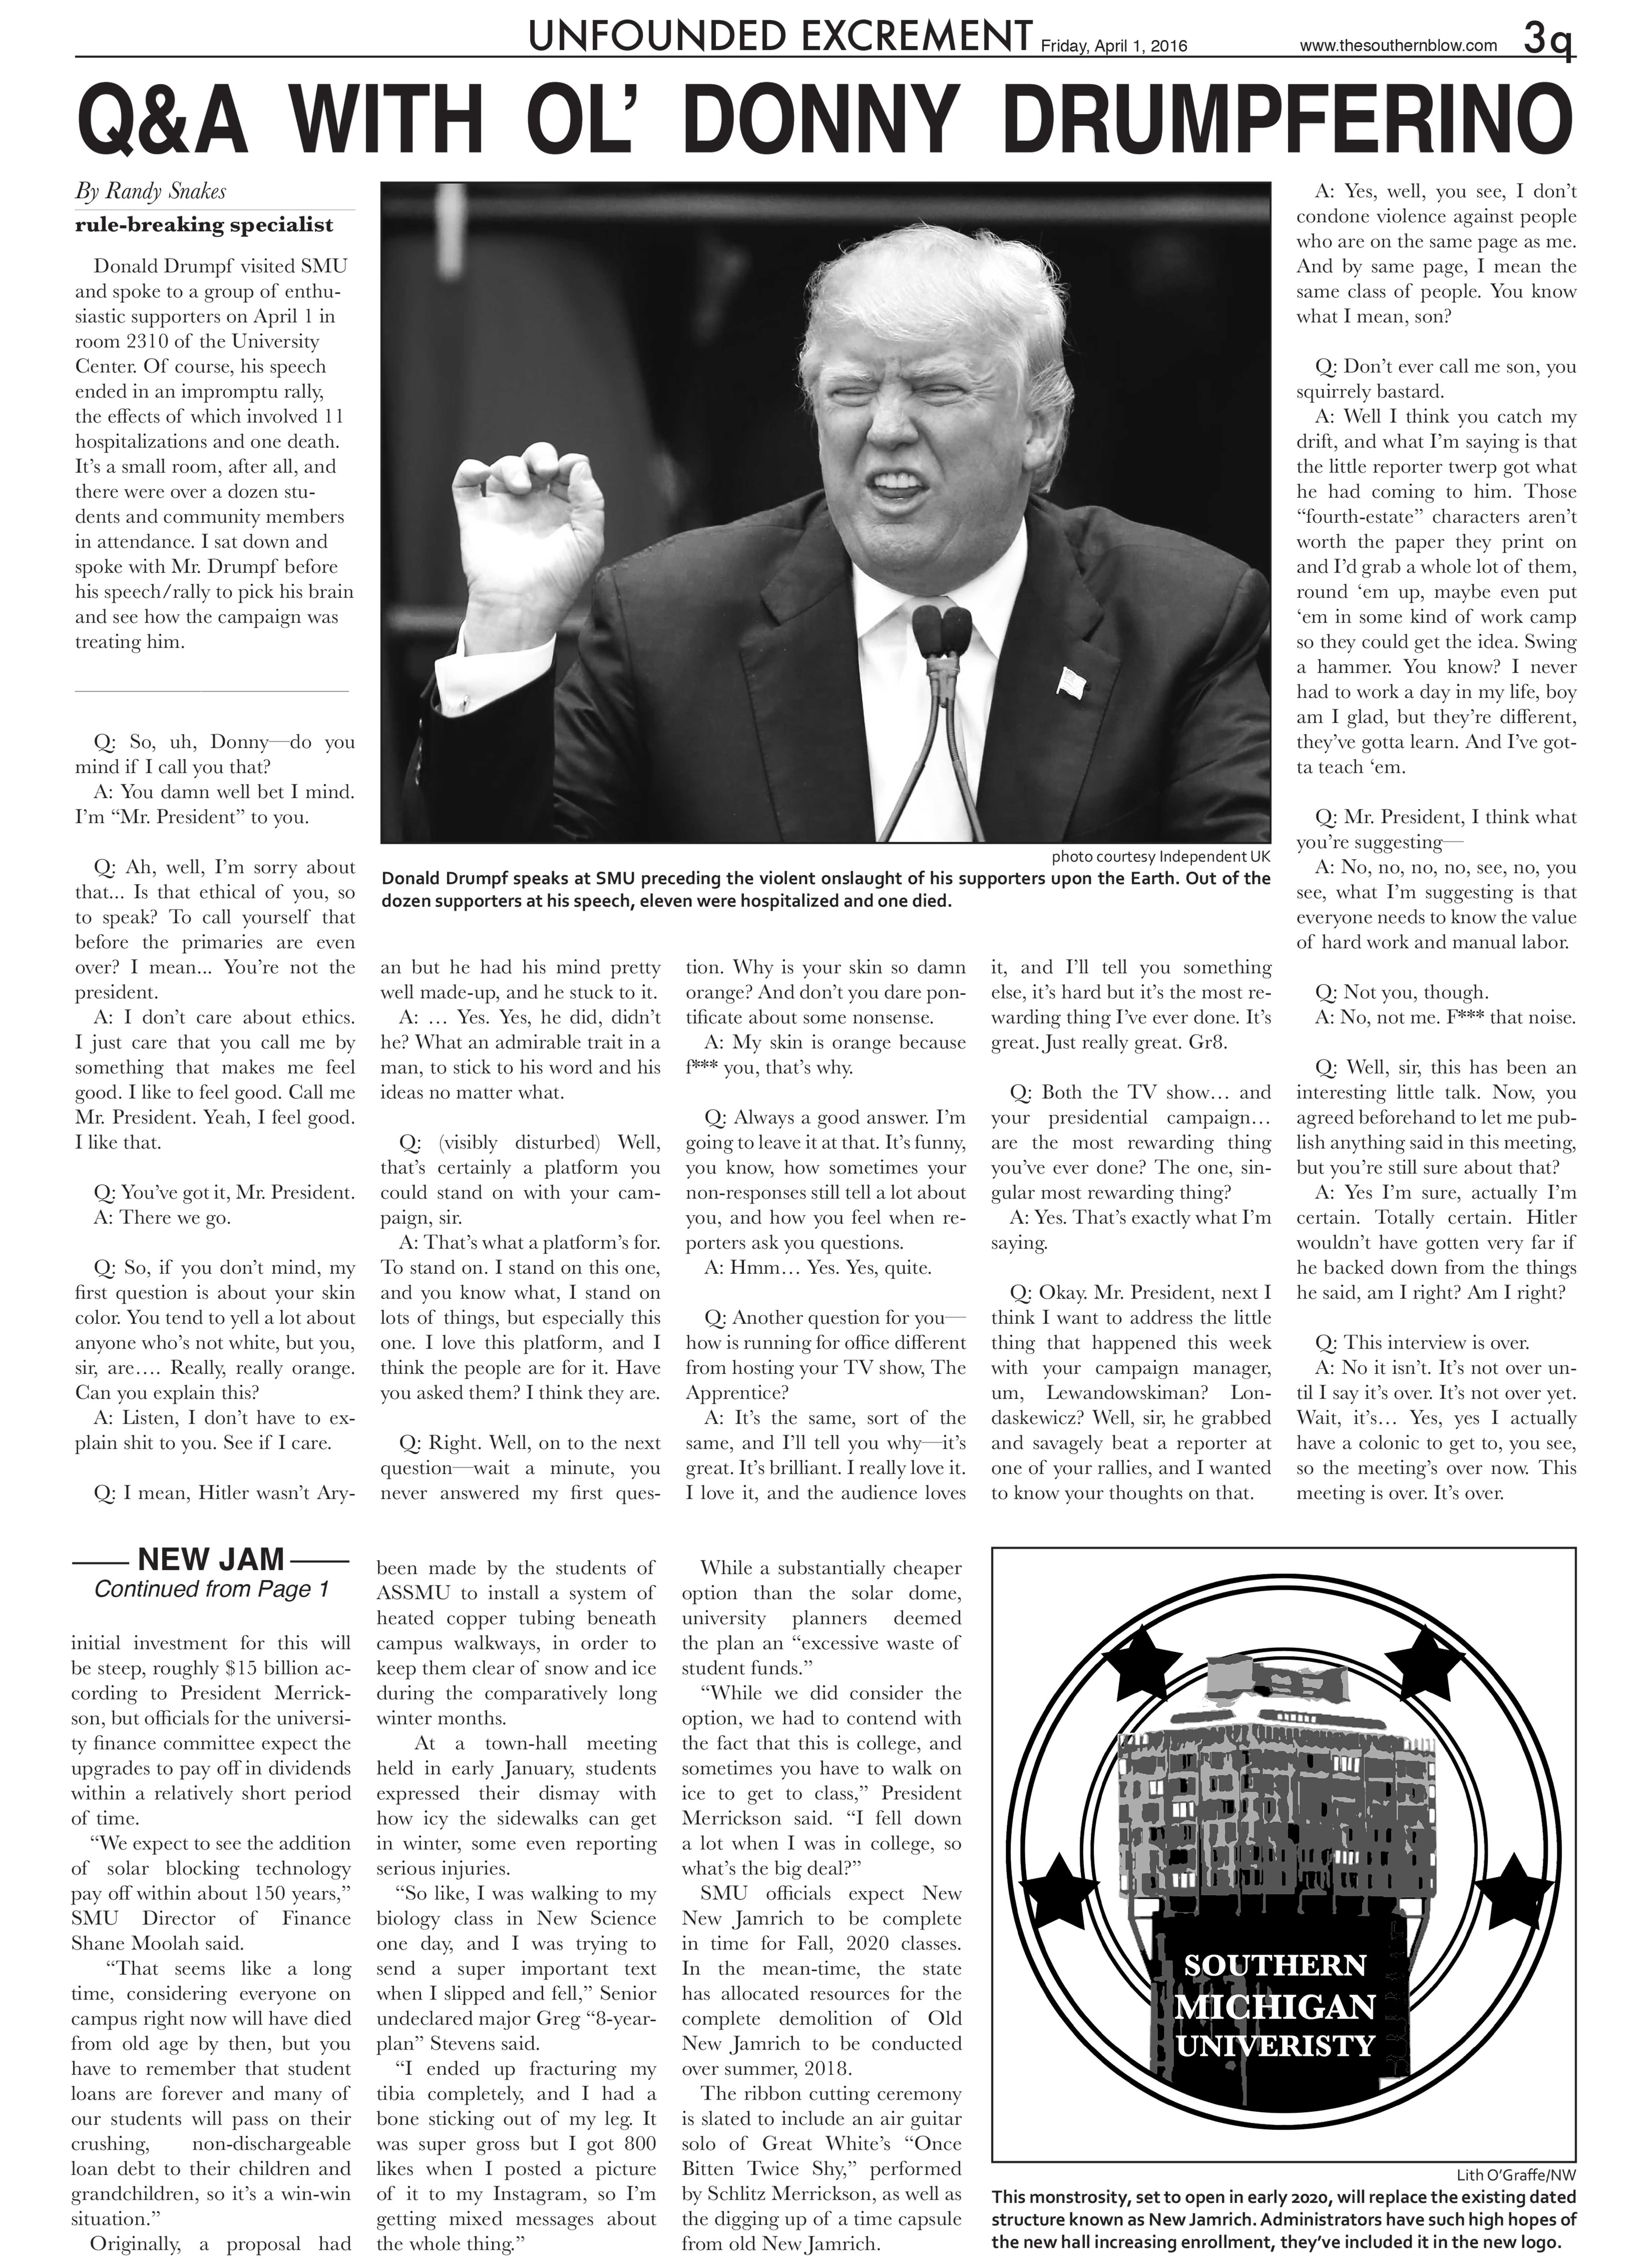 re-PDF pg. 3 INSERT